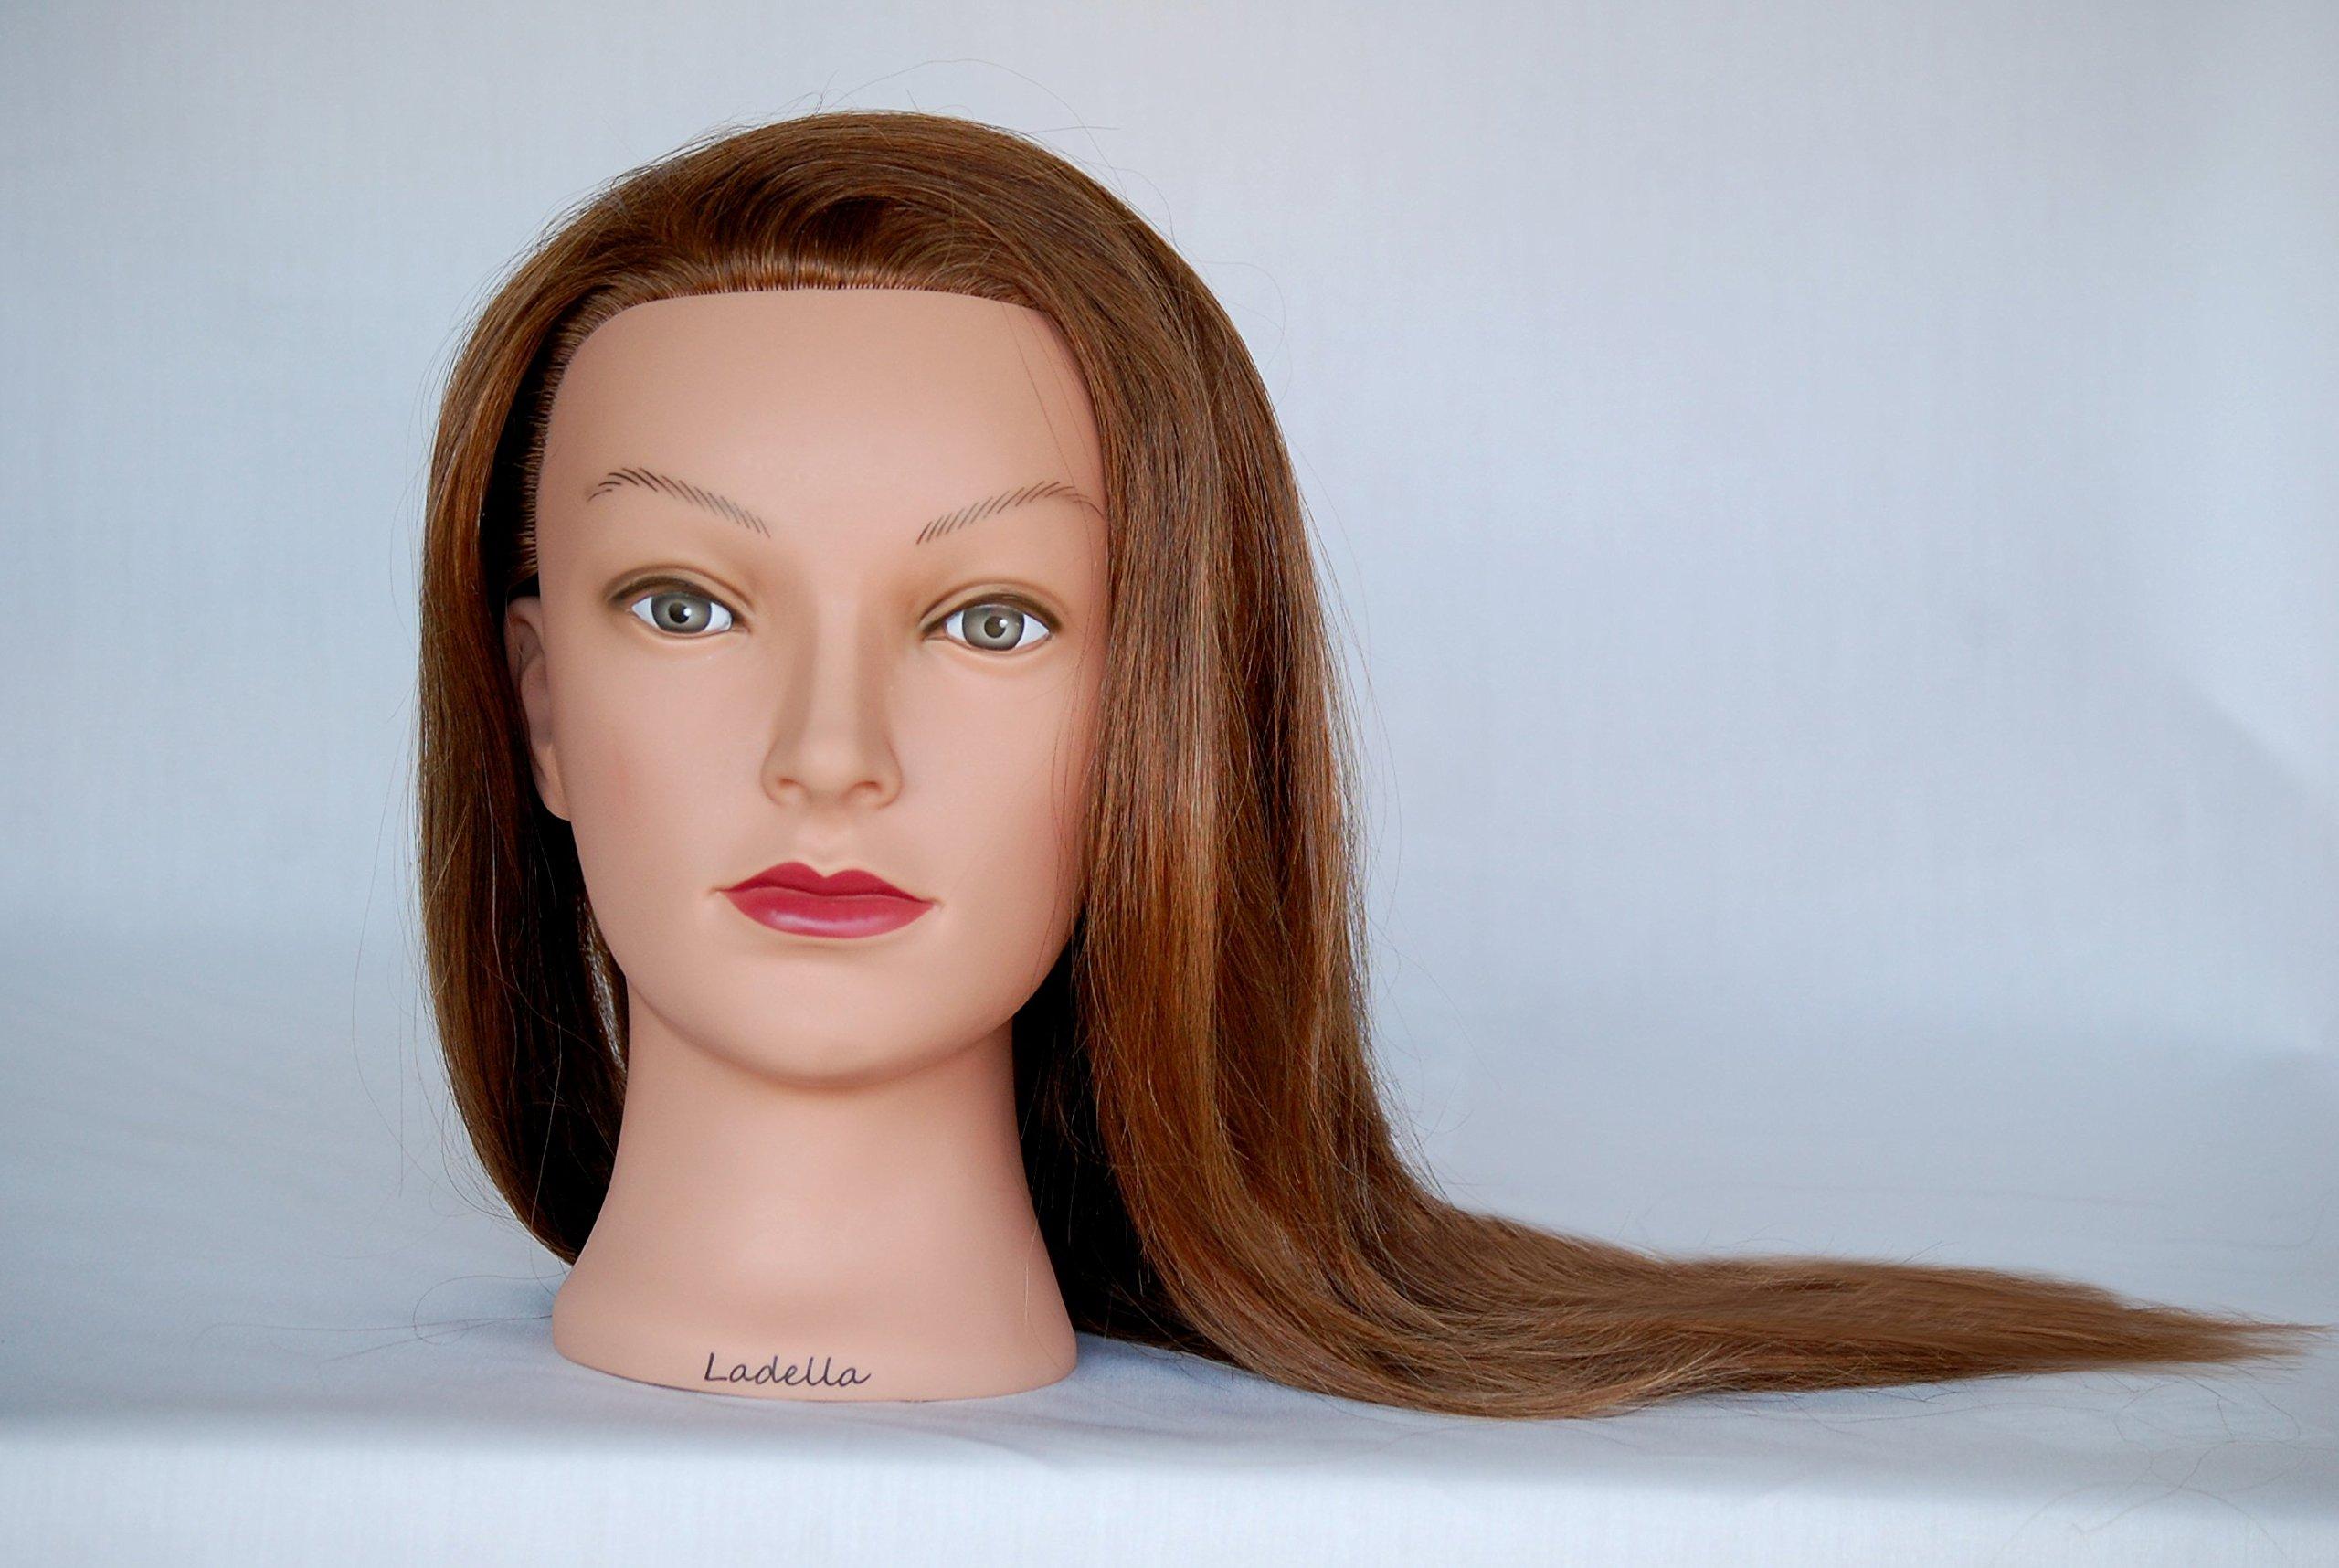 Ladella Beauty 20 - 22 '' Cosmetology (Heavy Density) 100 %Human Hair Mannequin Manikin Training Head - Avery